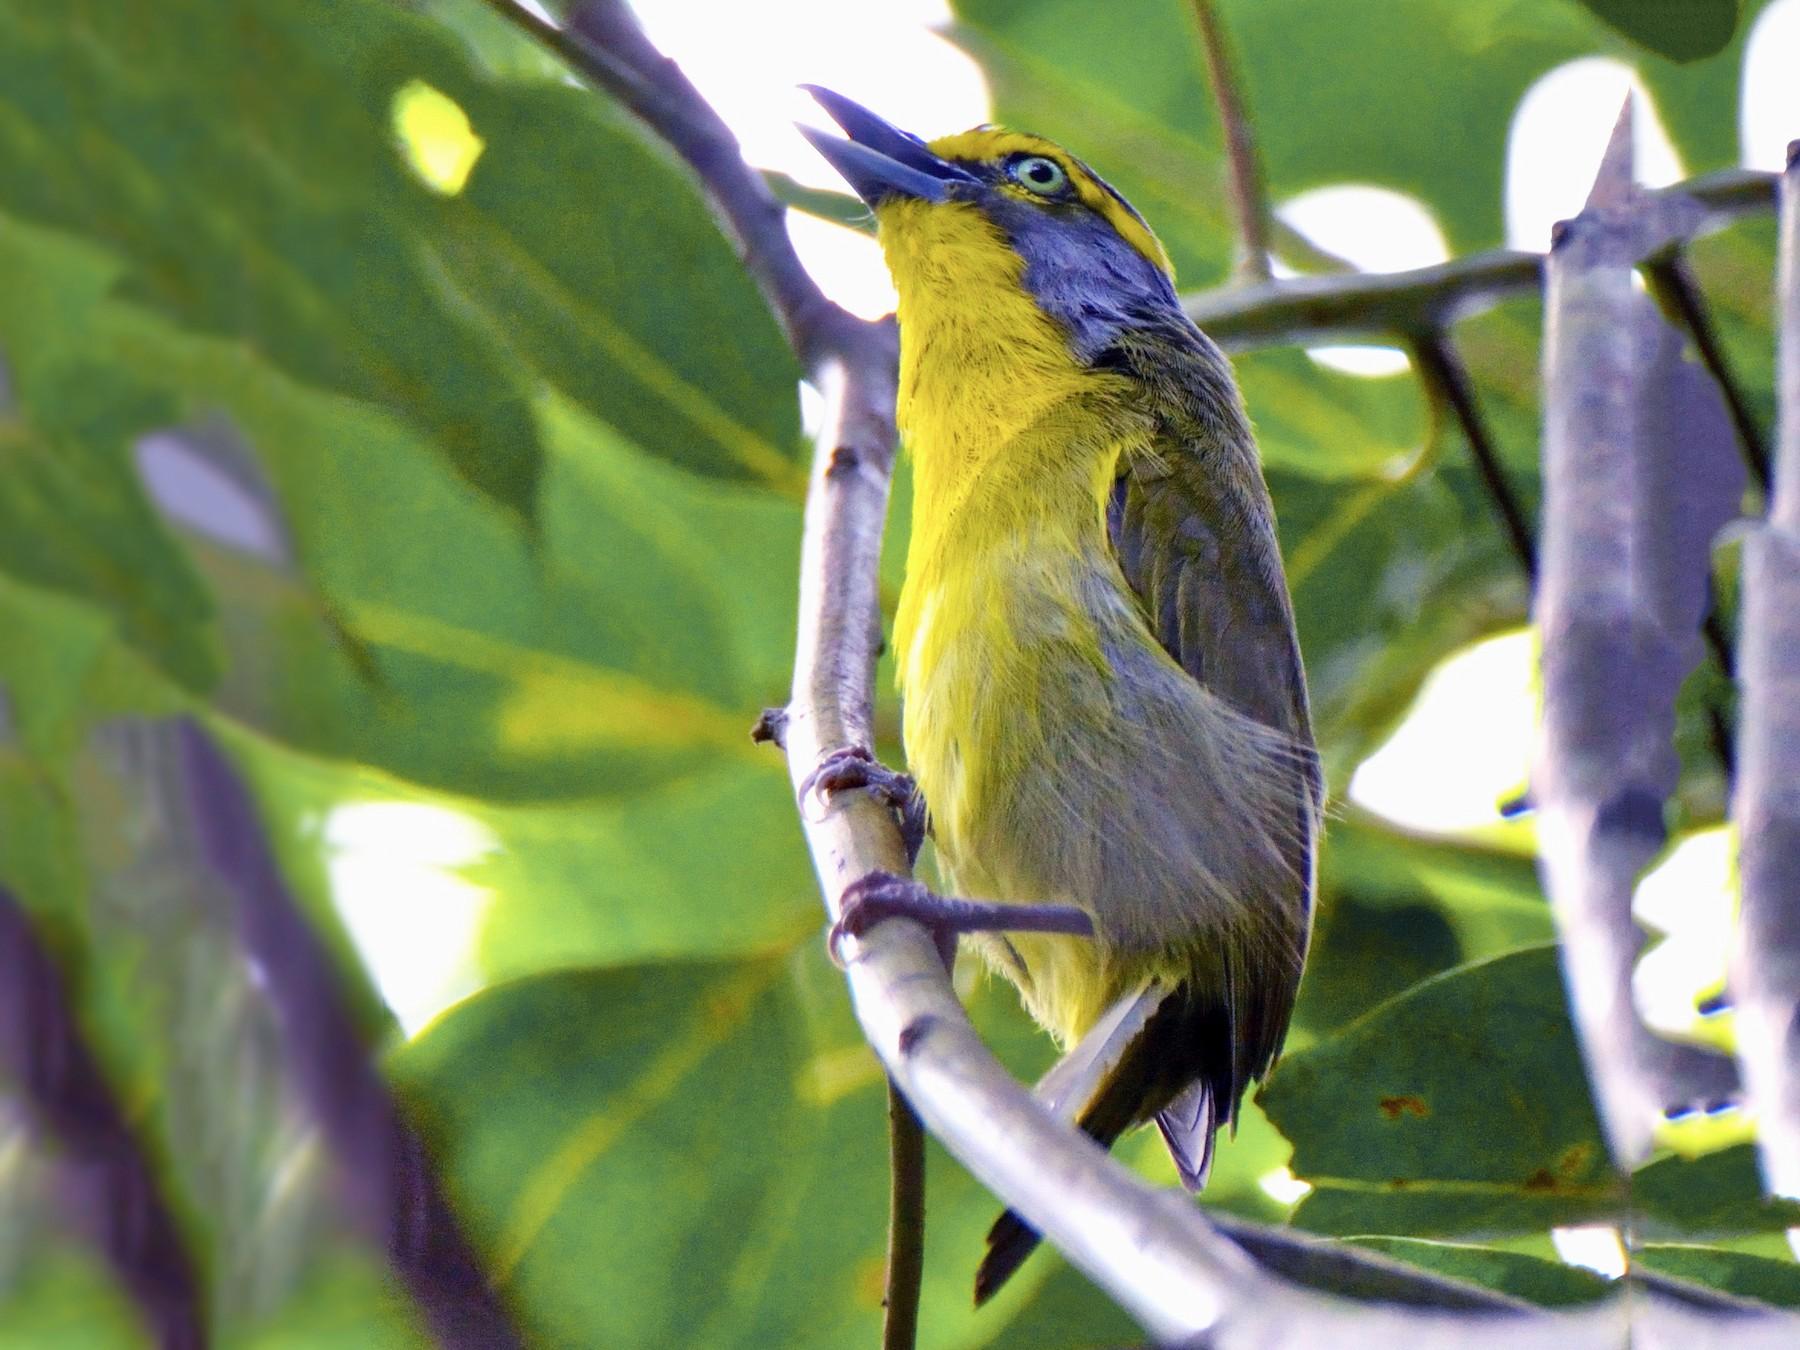 Slaty-capped Shrike-Vireo - Marcia Balestri